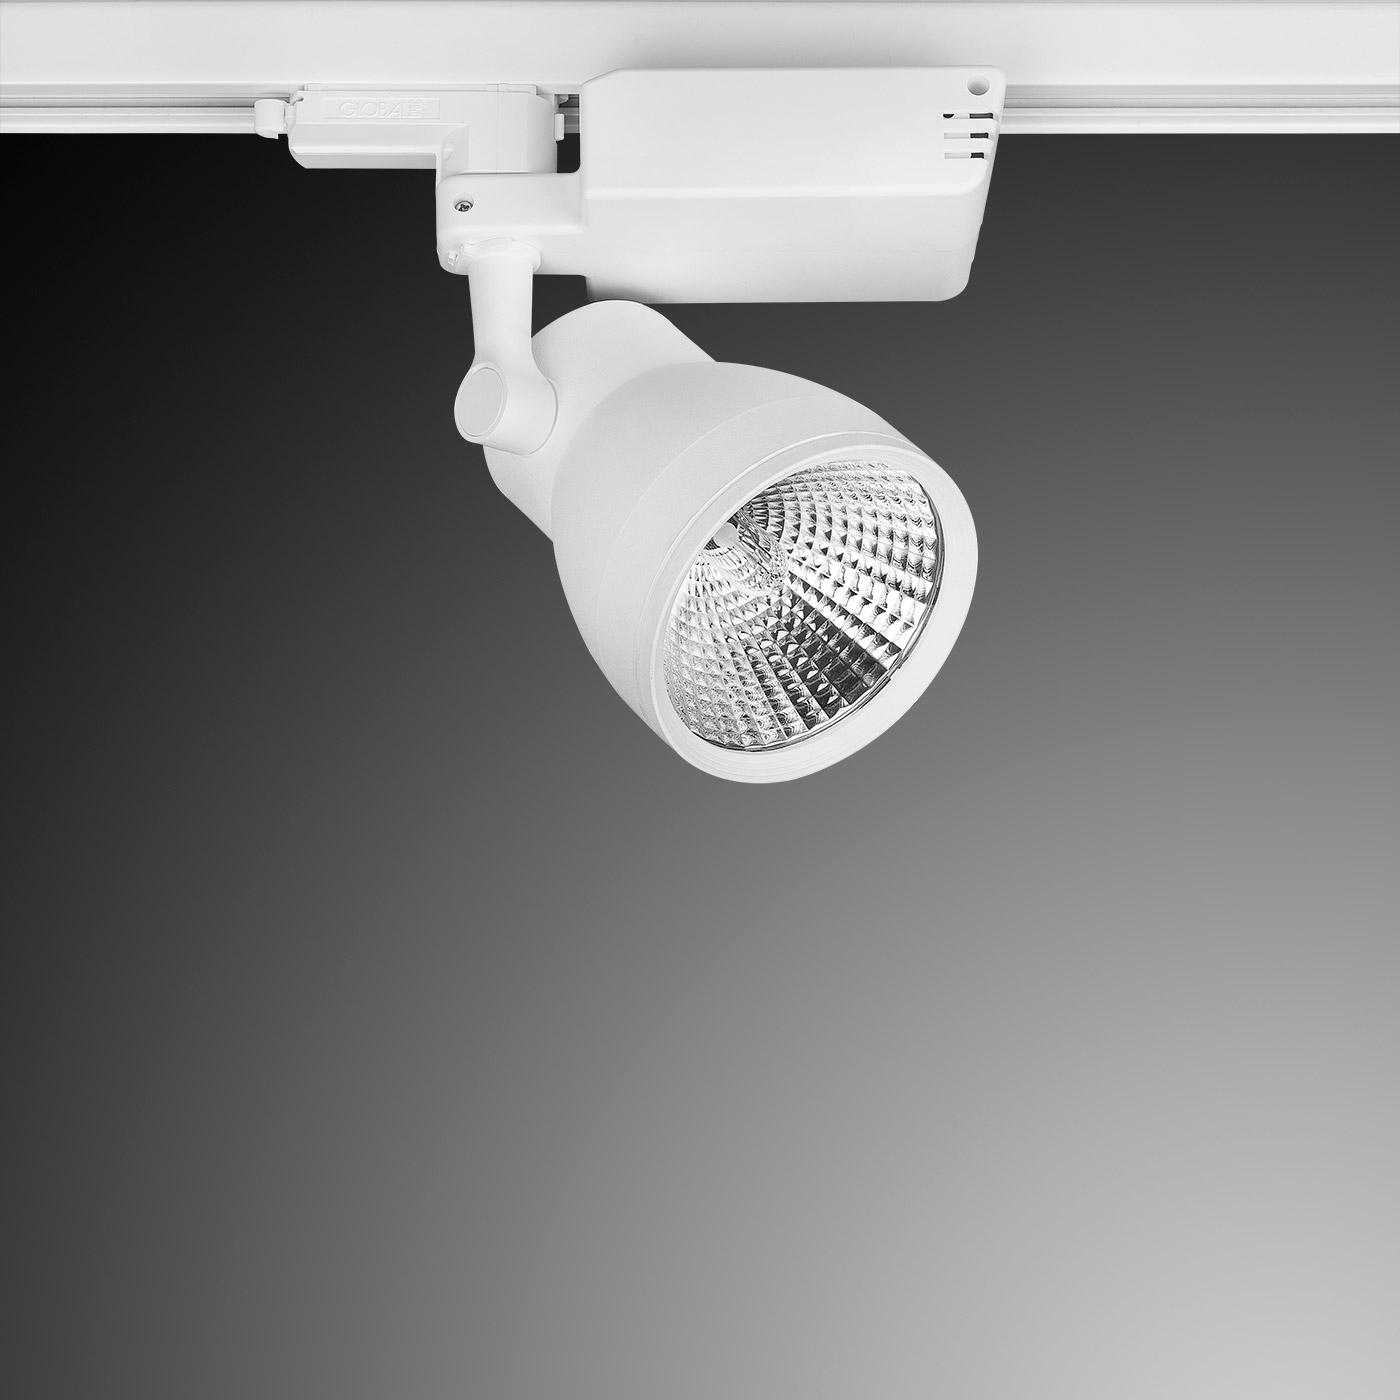 EVOSPOT | LAMP83 - Effiziente Beleuchtungssysteme